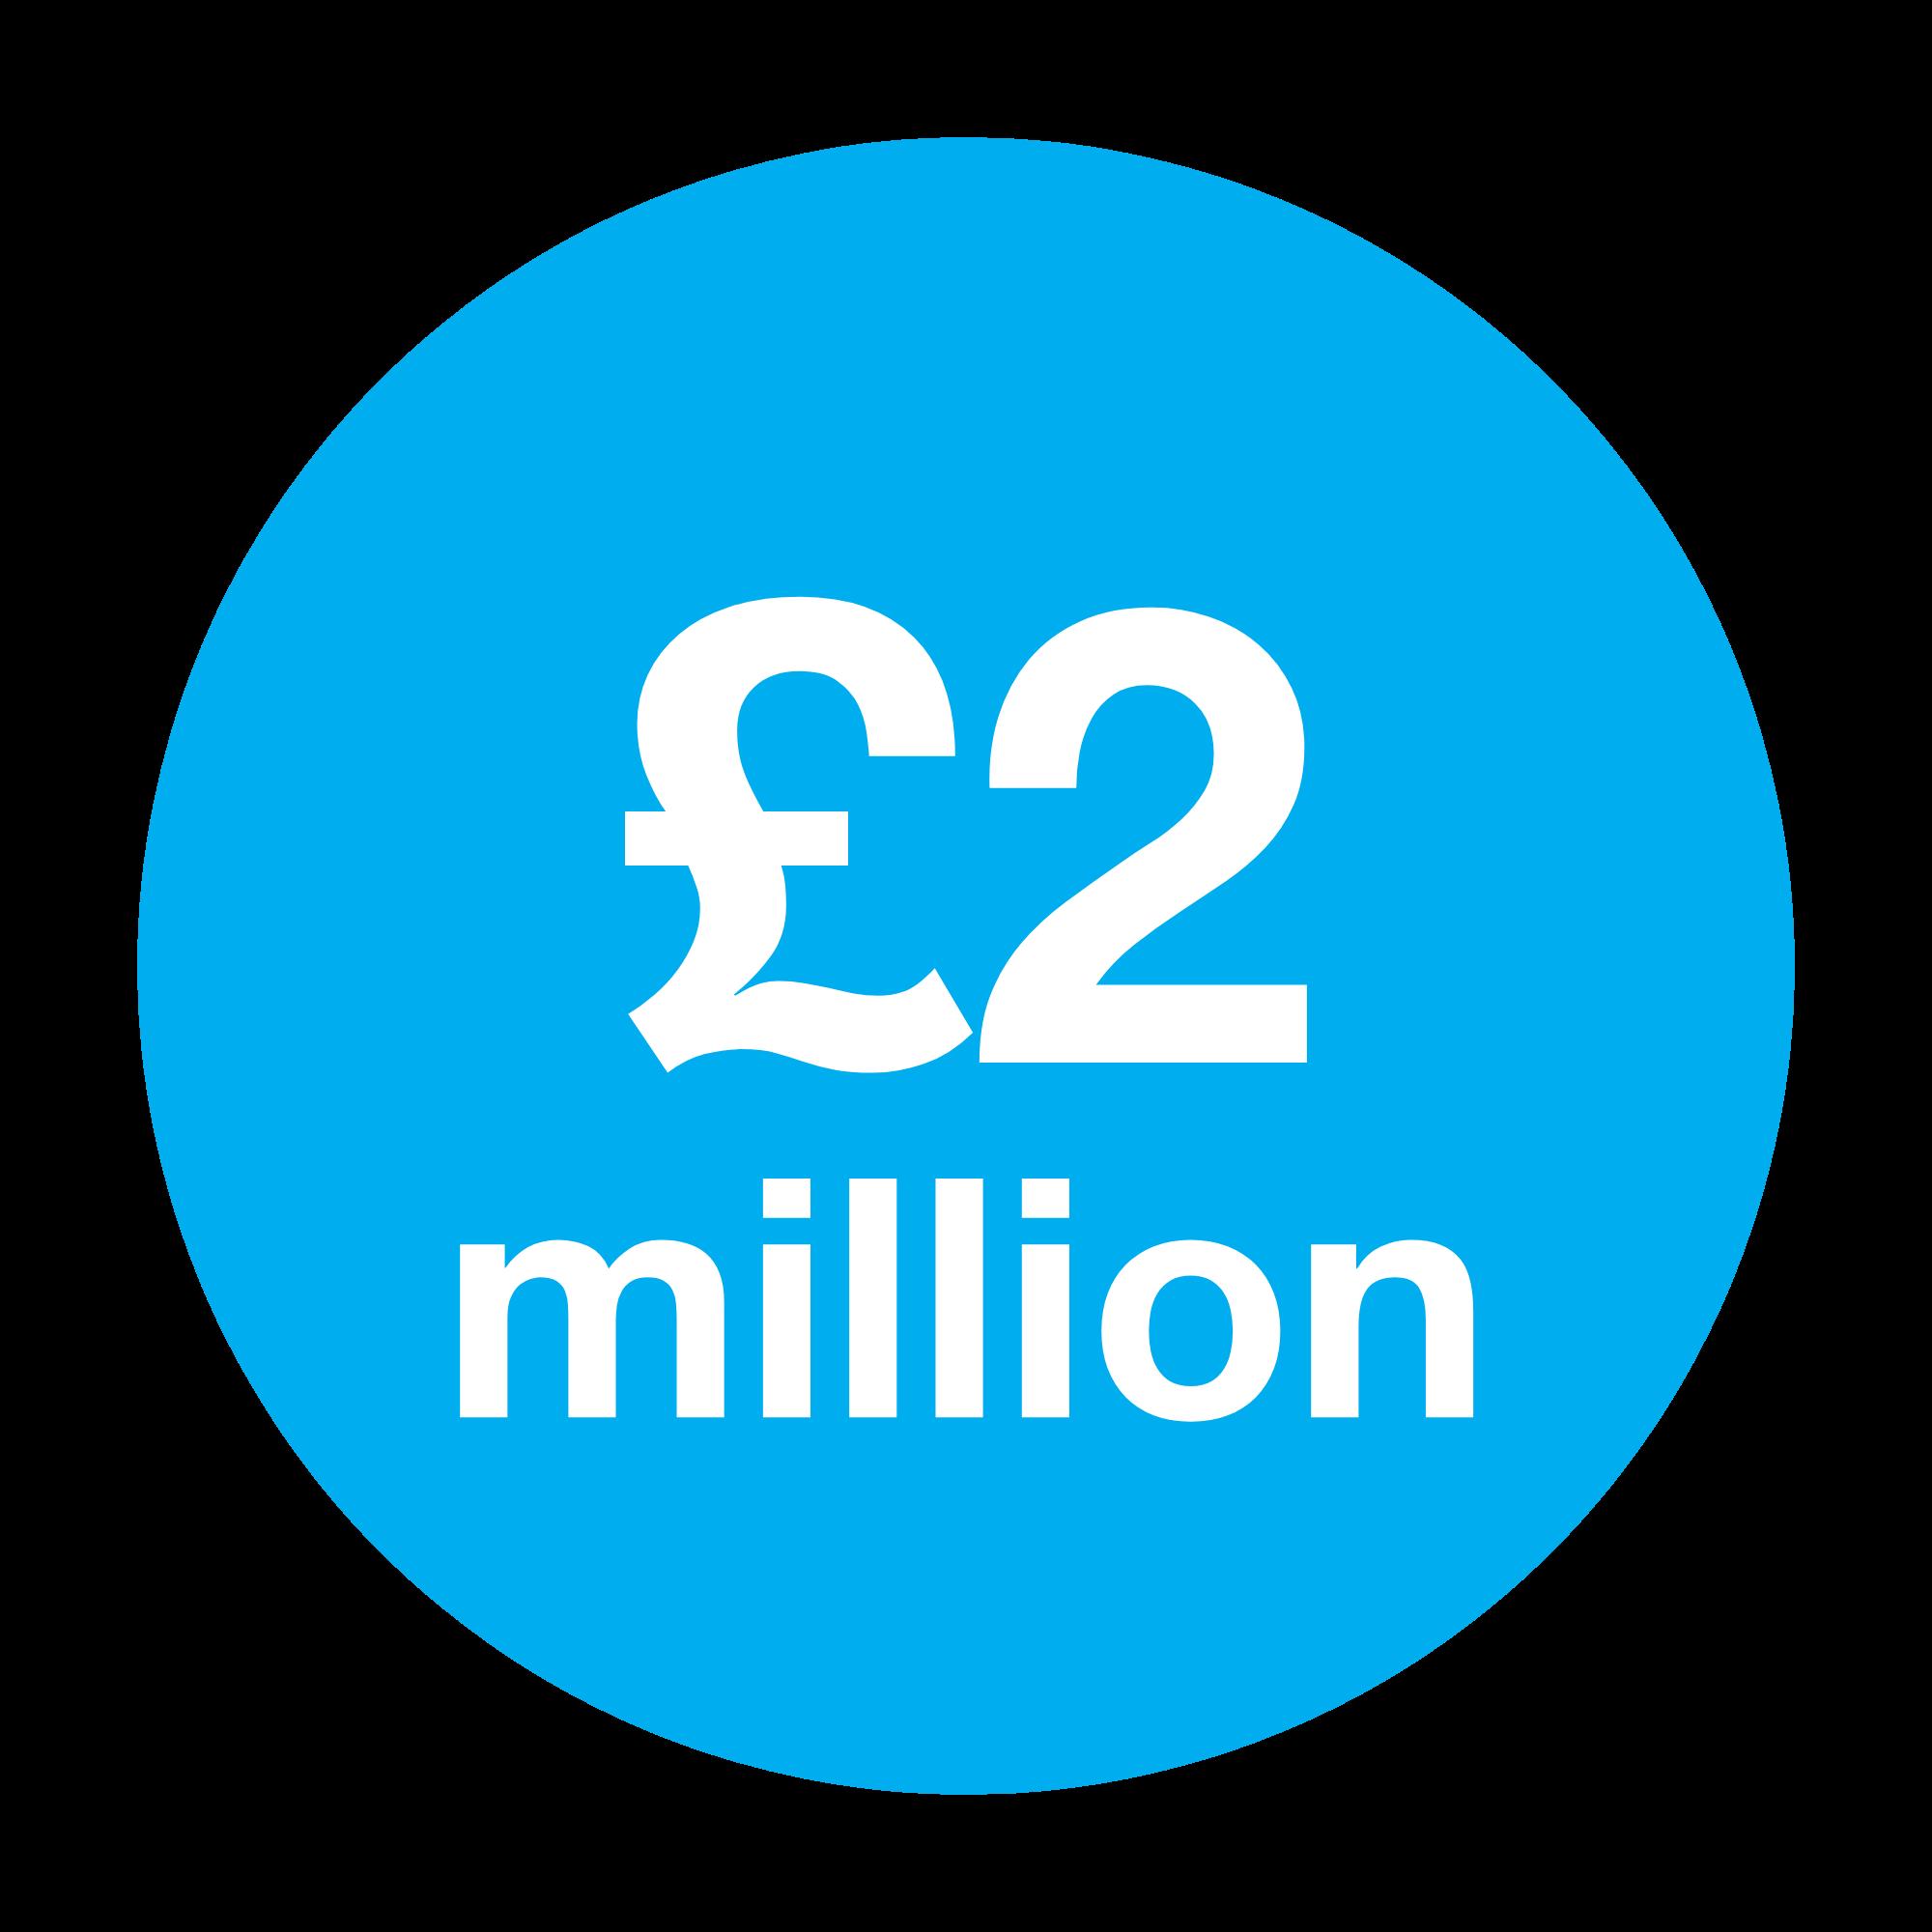 2 million pound saved in travel costs